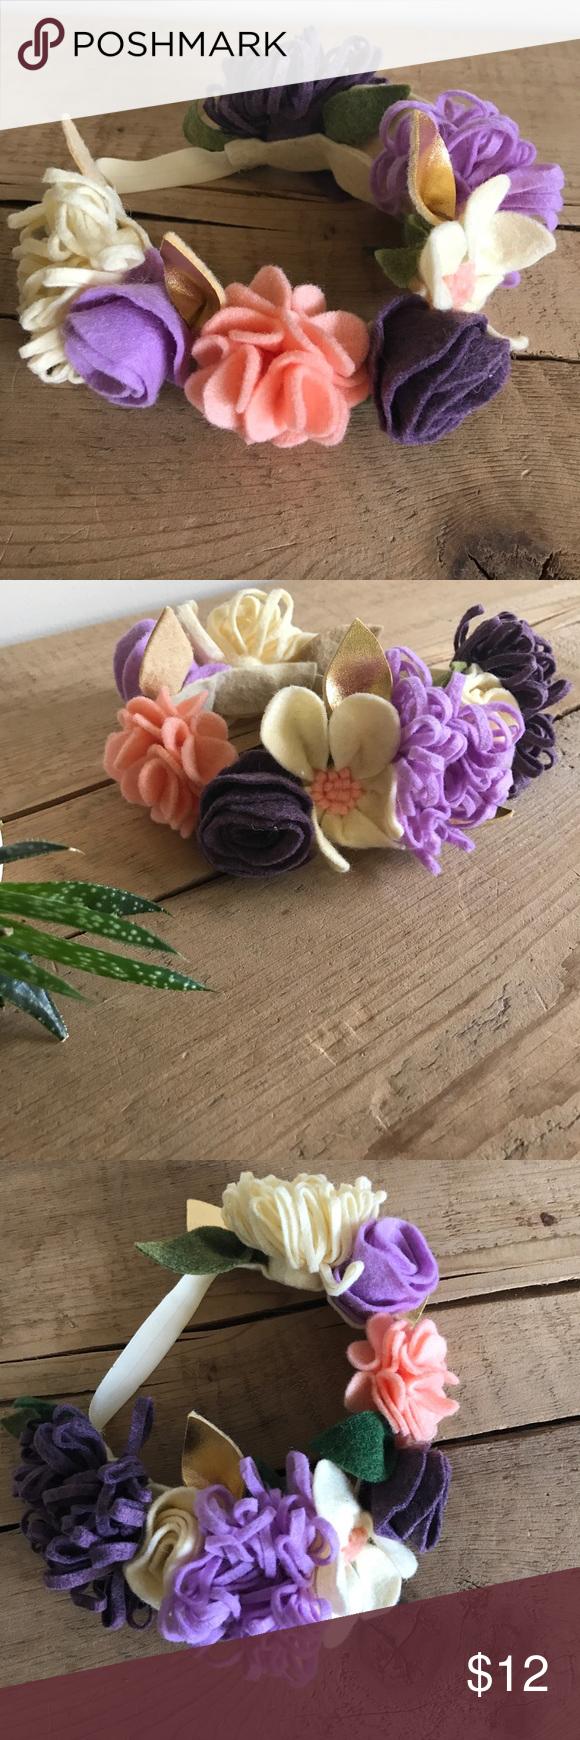 Felt Flower Headband  Felt Flower Headband #feltflowerheadbands Felt Flower Headband  Felt Flower Headband #feltflowerheadbands